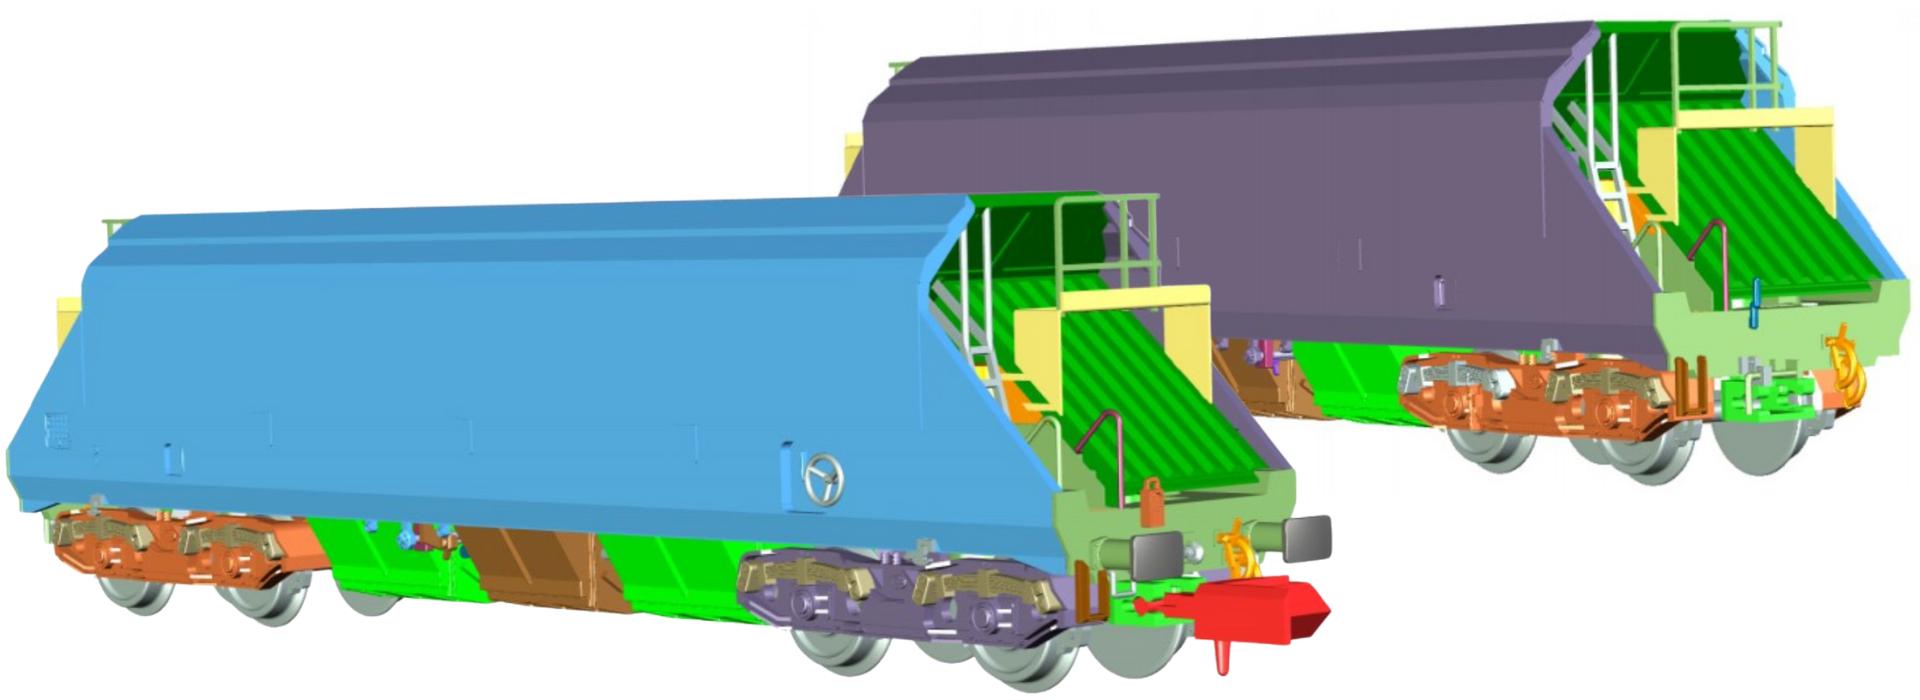 Dapol N JHA Wagons in Yeoman Livery